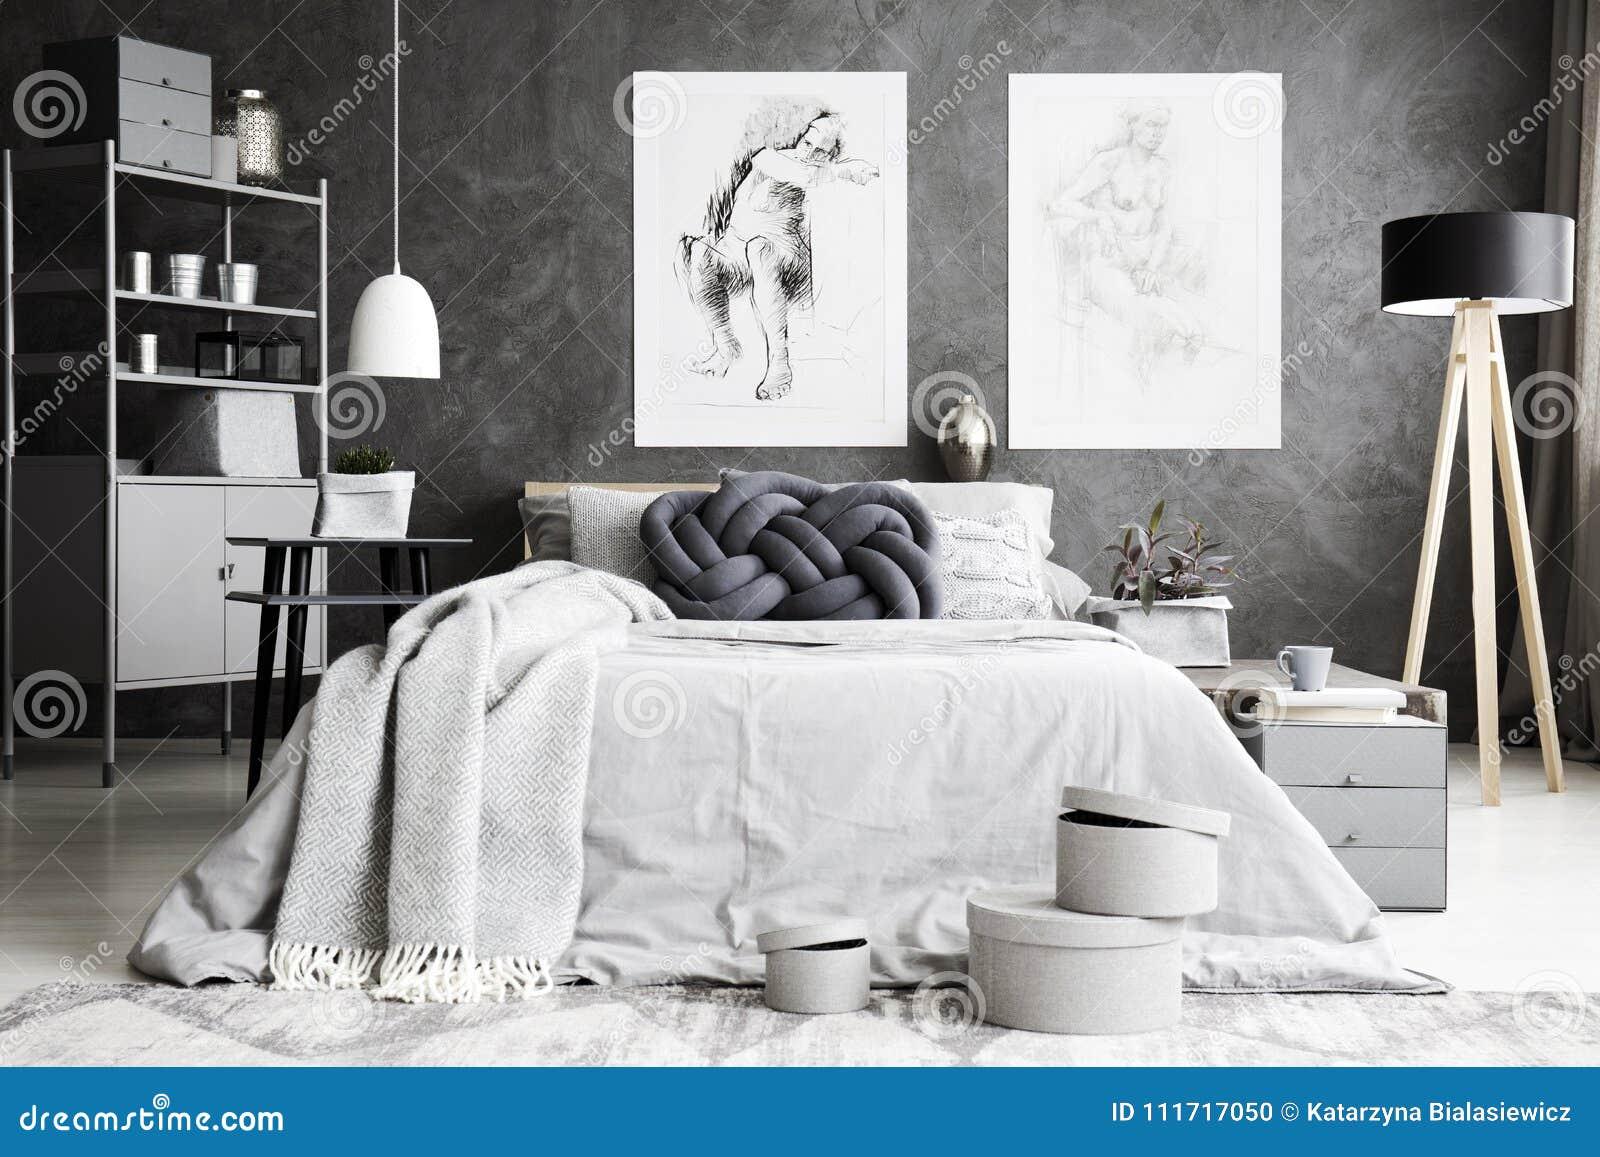 Handmade cushion on bed